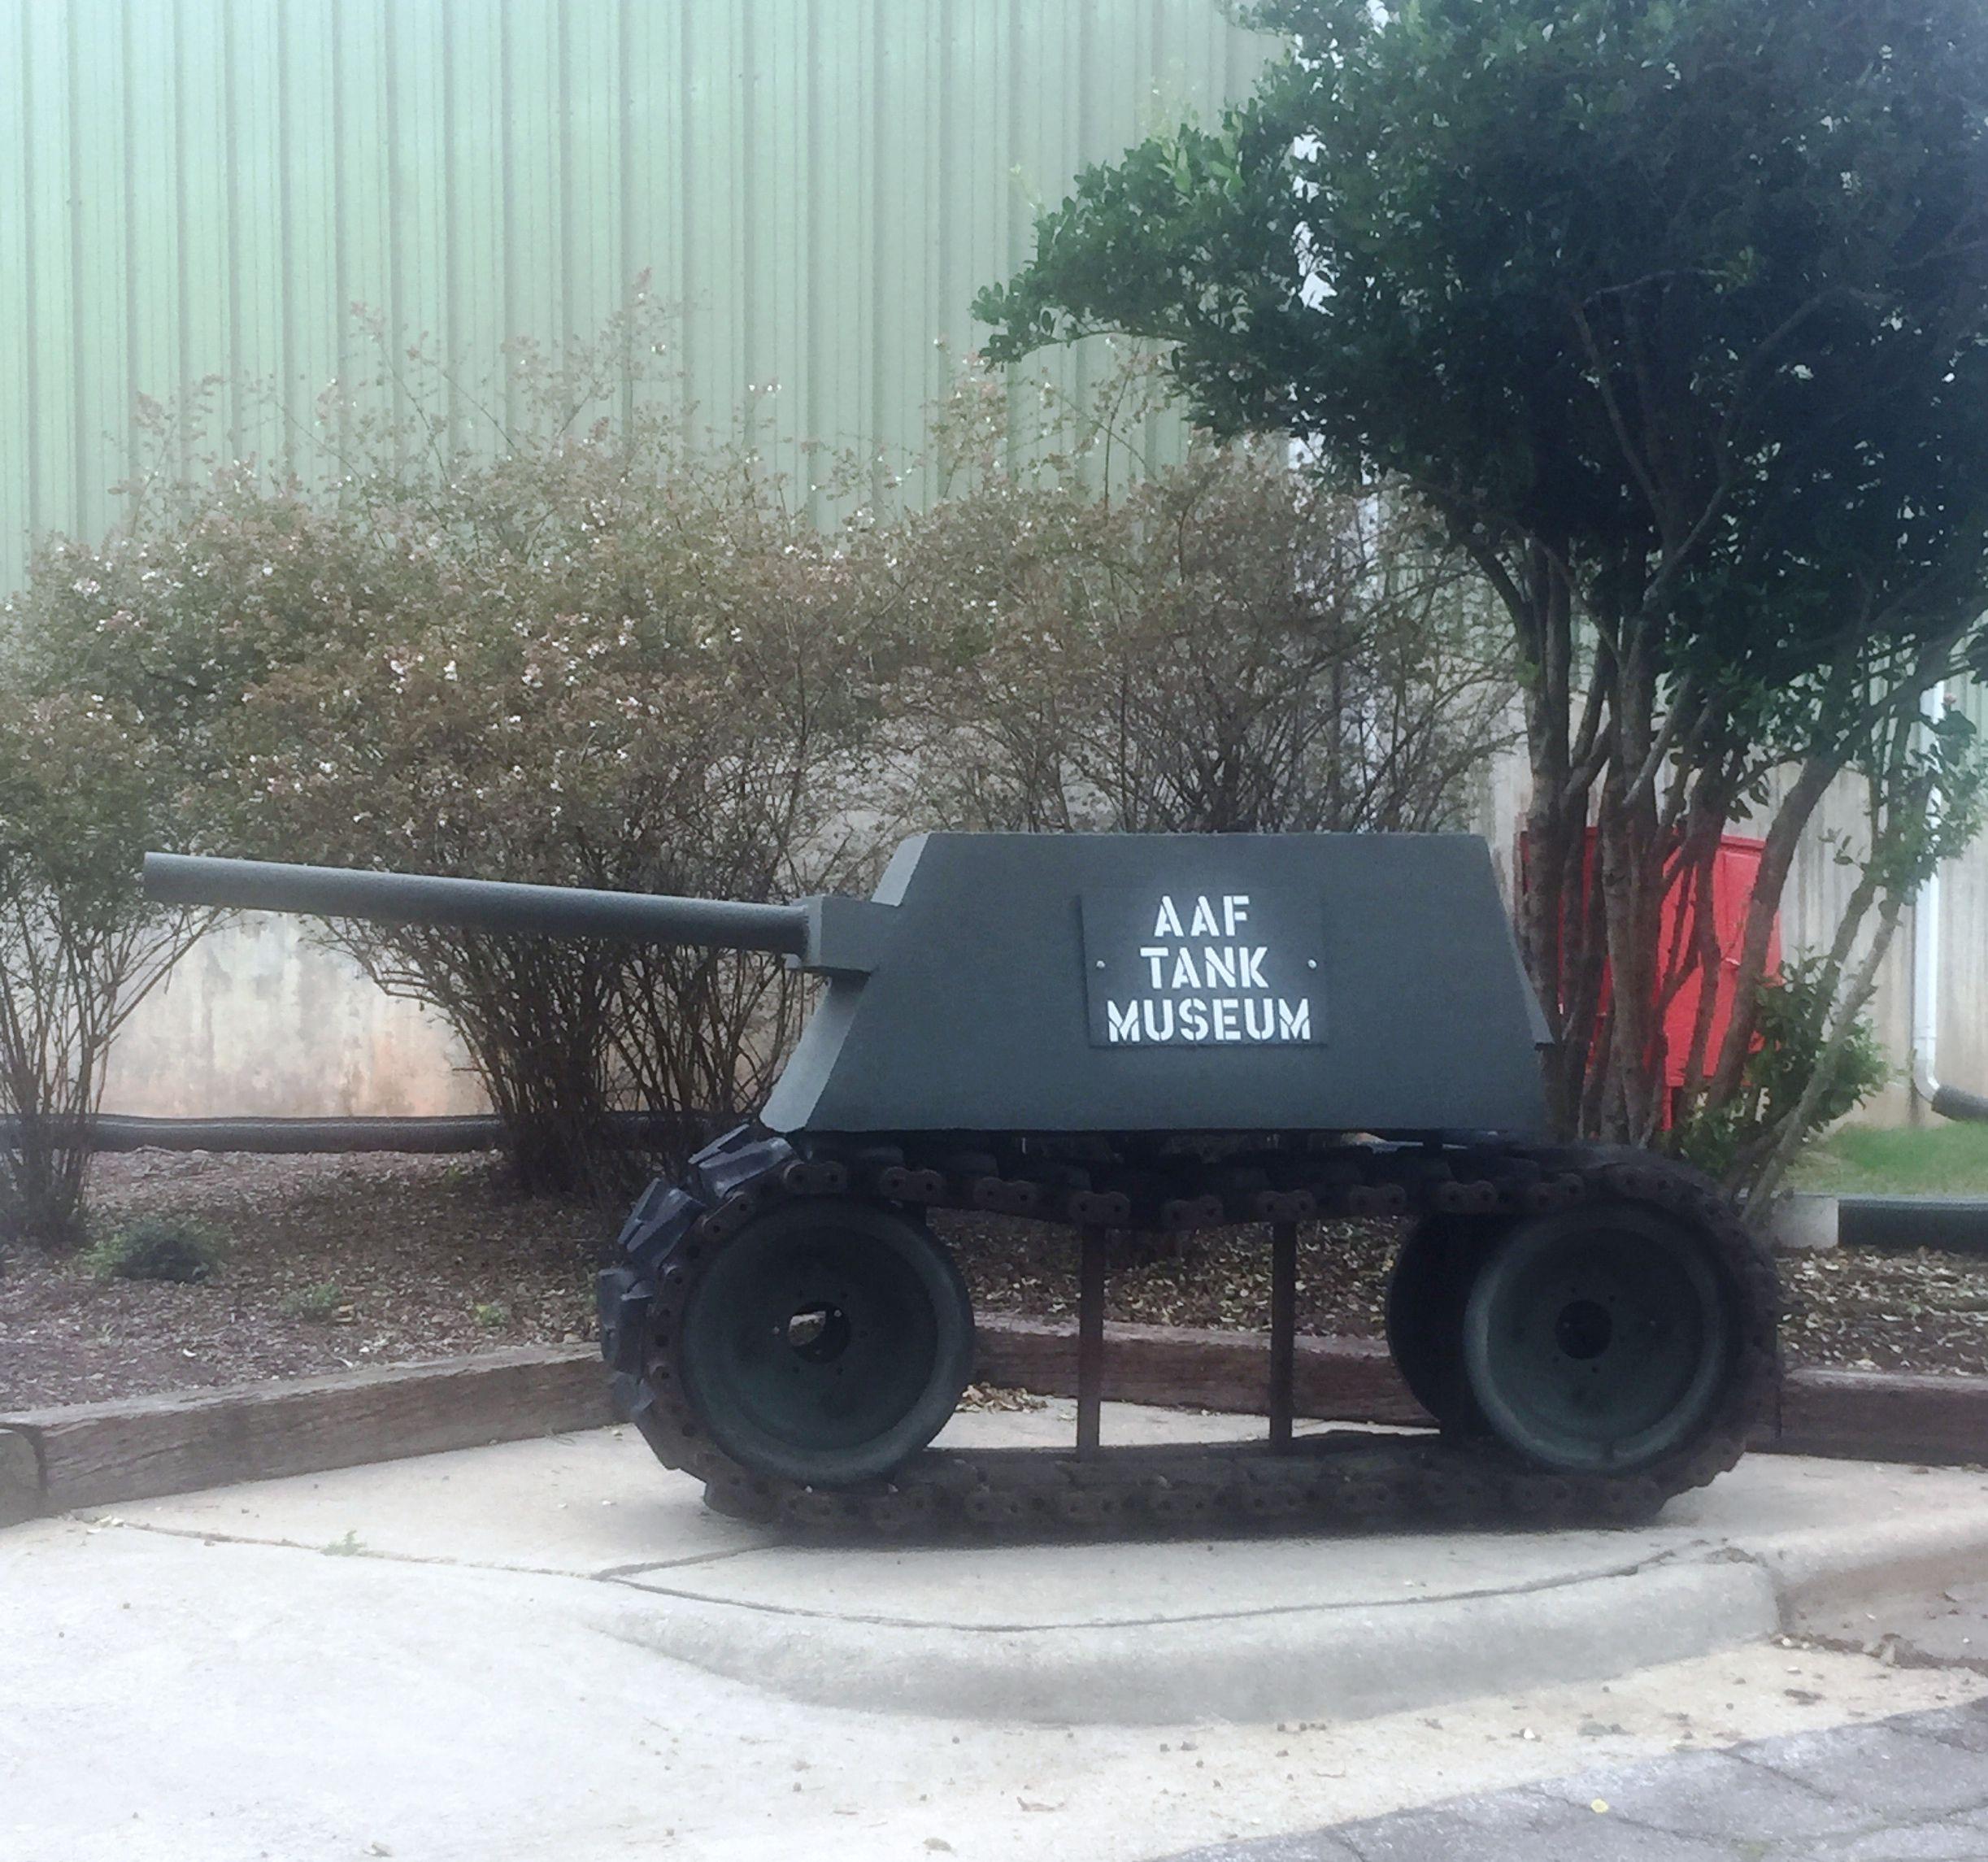 AAF Tank Museum In Danville, VA.-Photo By Lew Adams